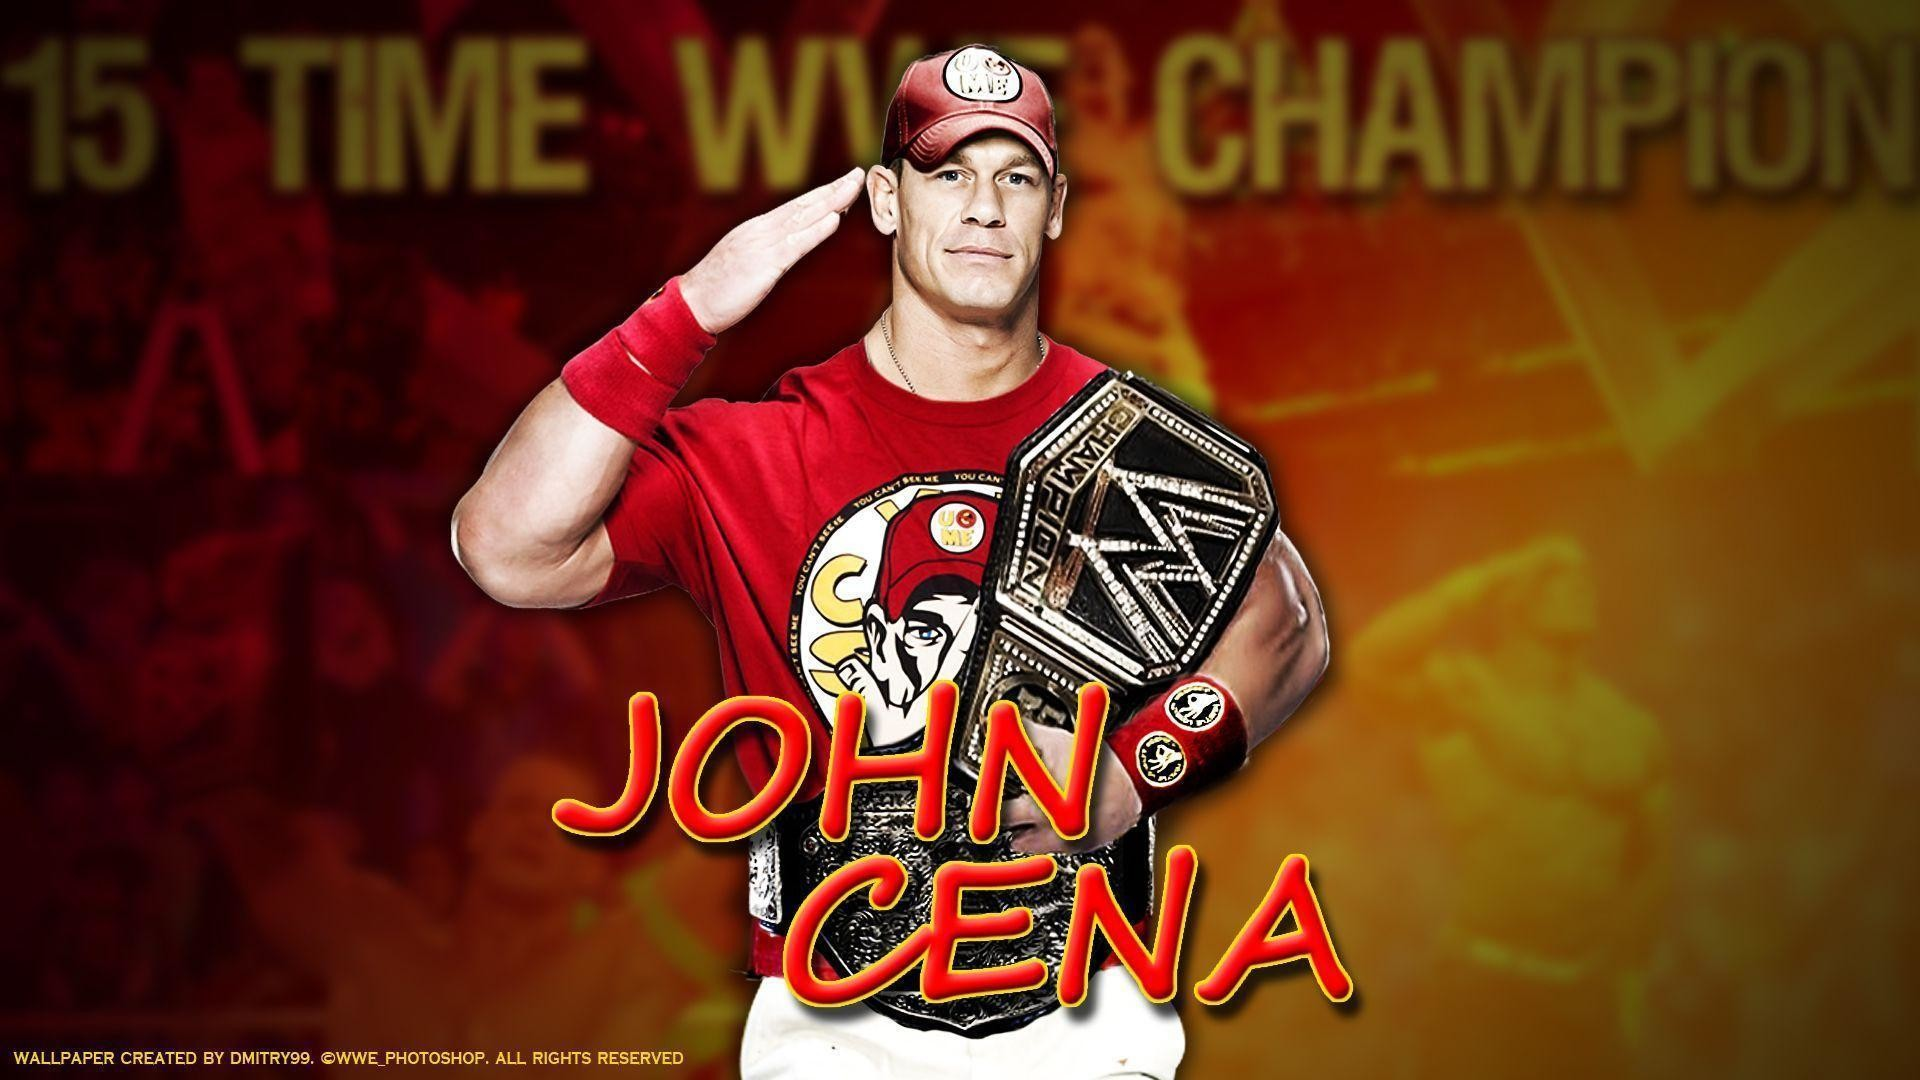 John Cena New Hd Wallpapers 68 Images